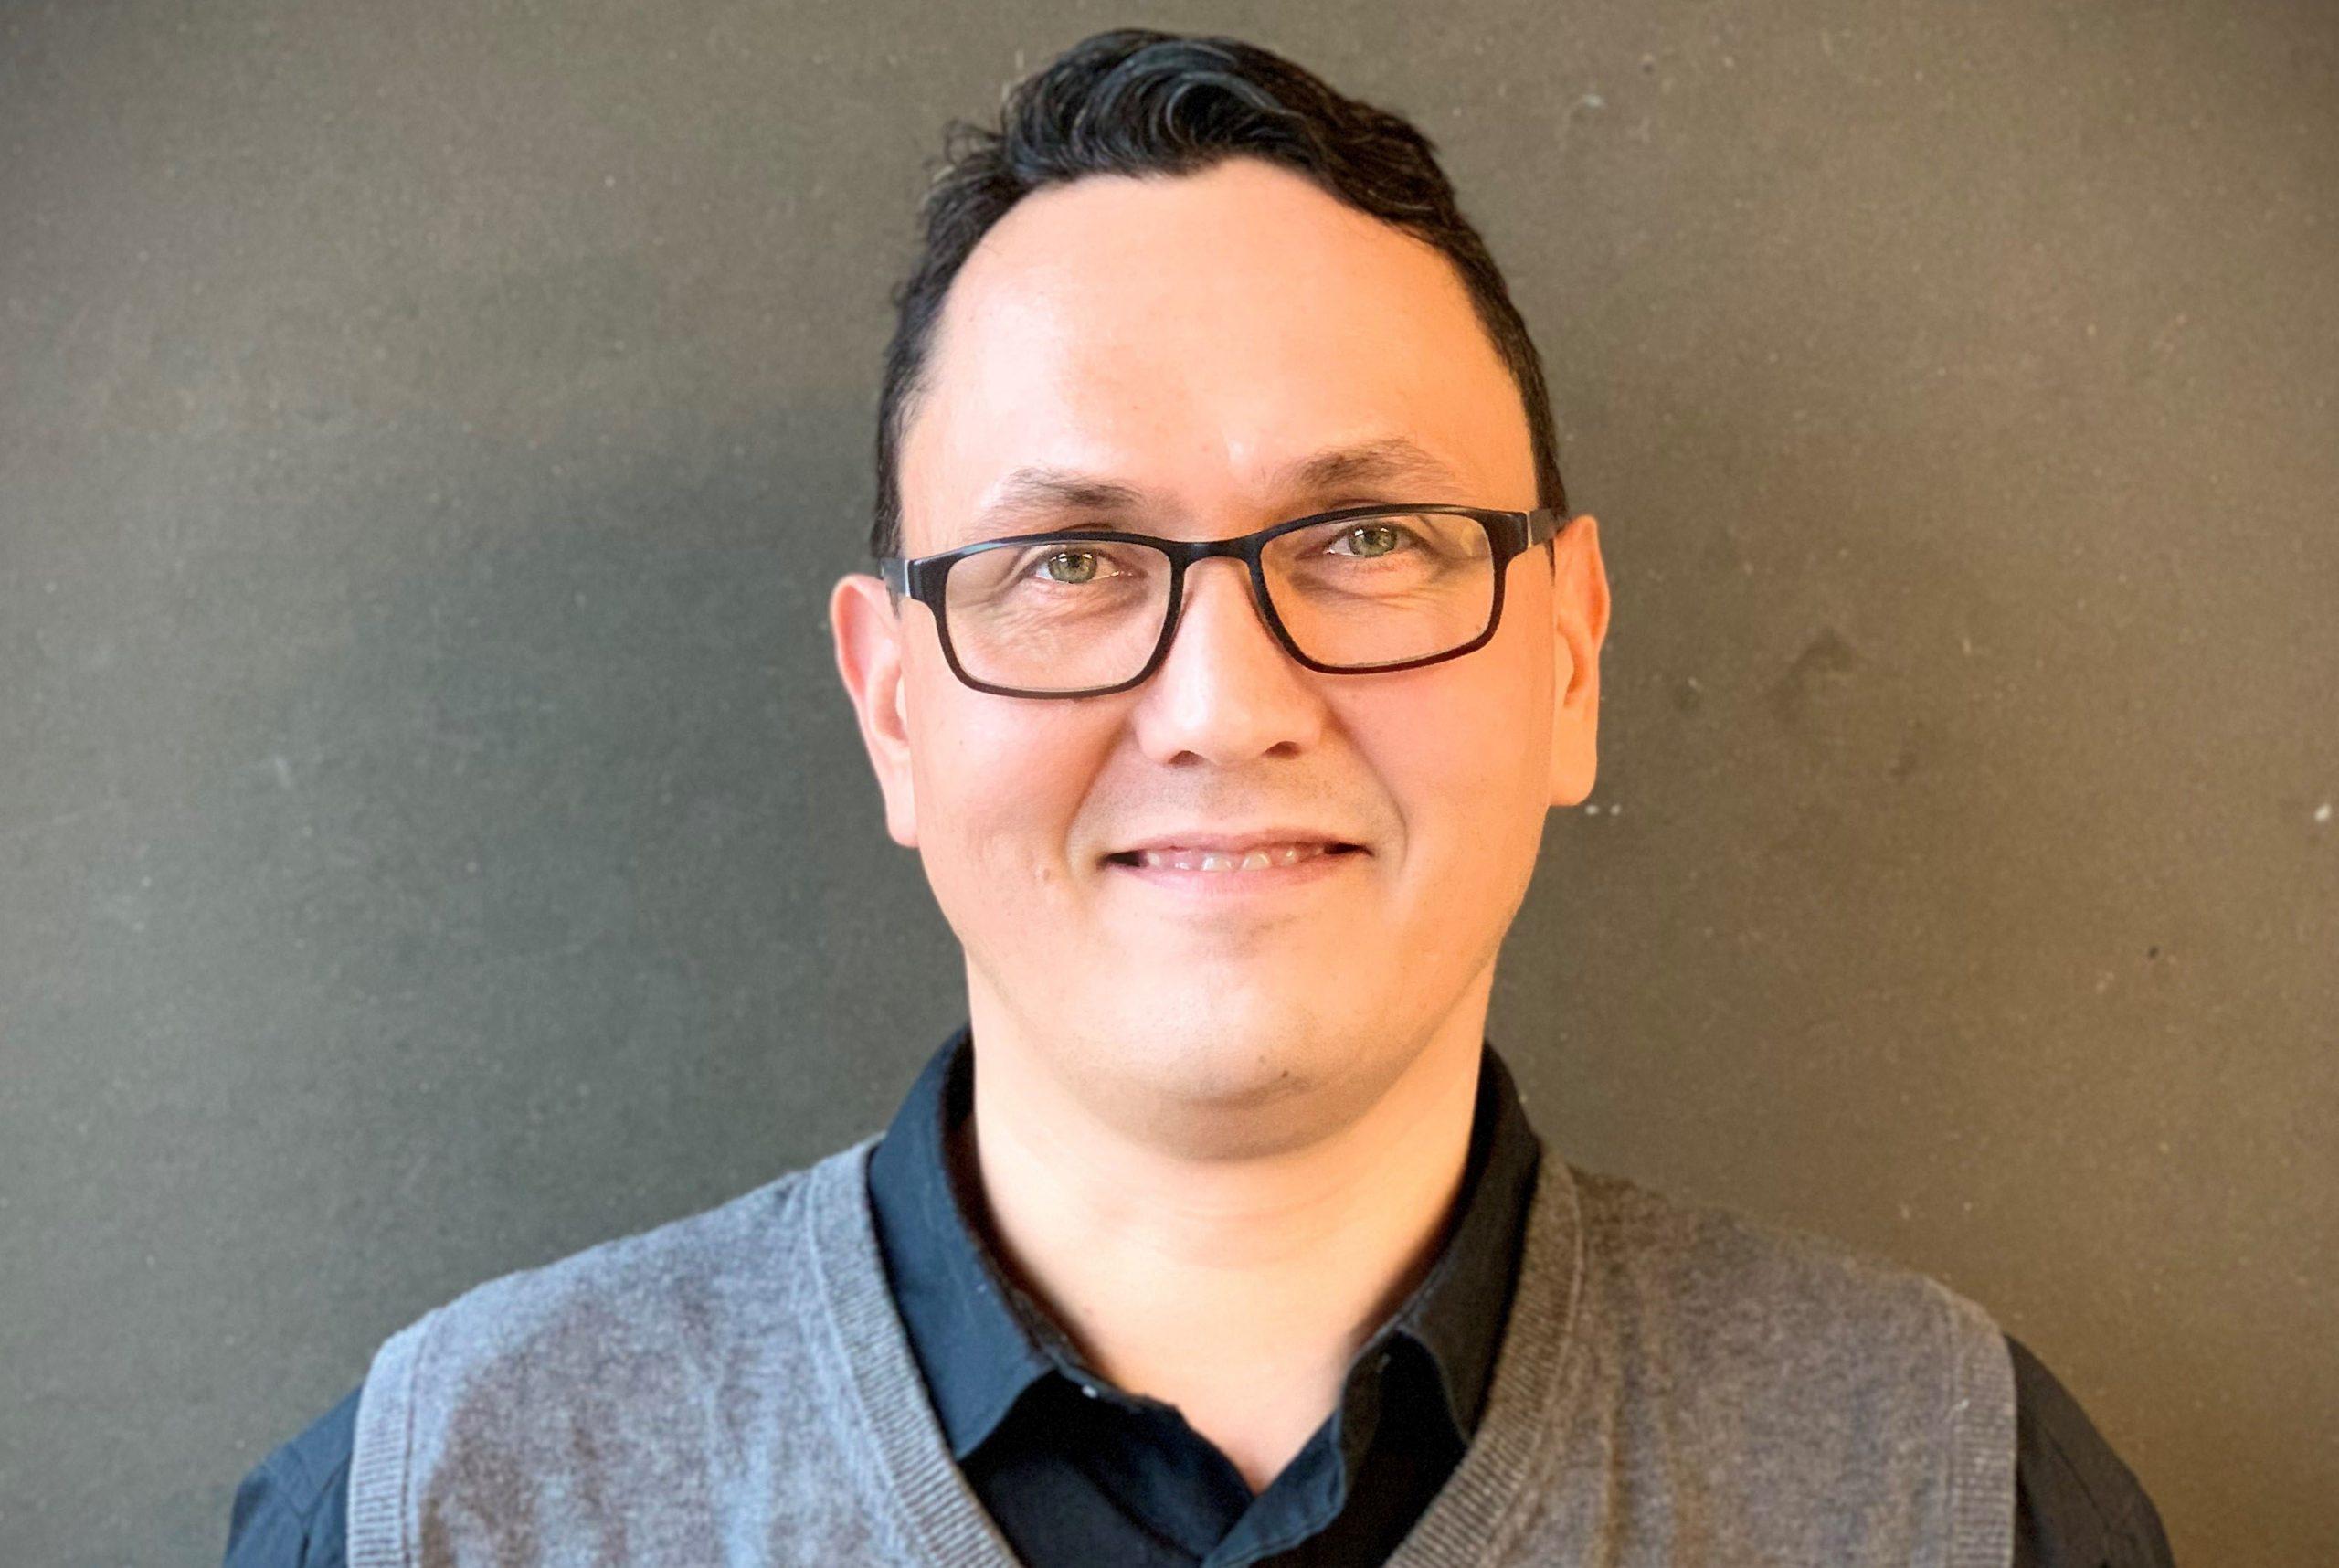 Kontakt SINUZ Projektleder Rasmus Thode Christensen